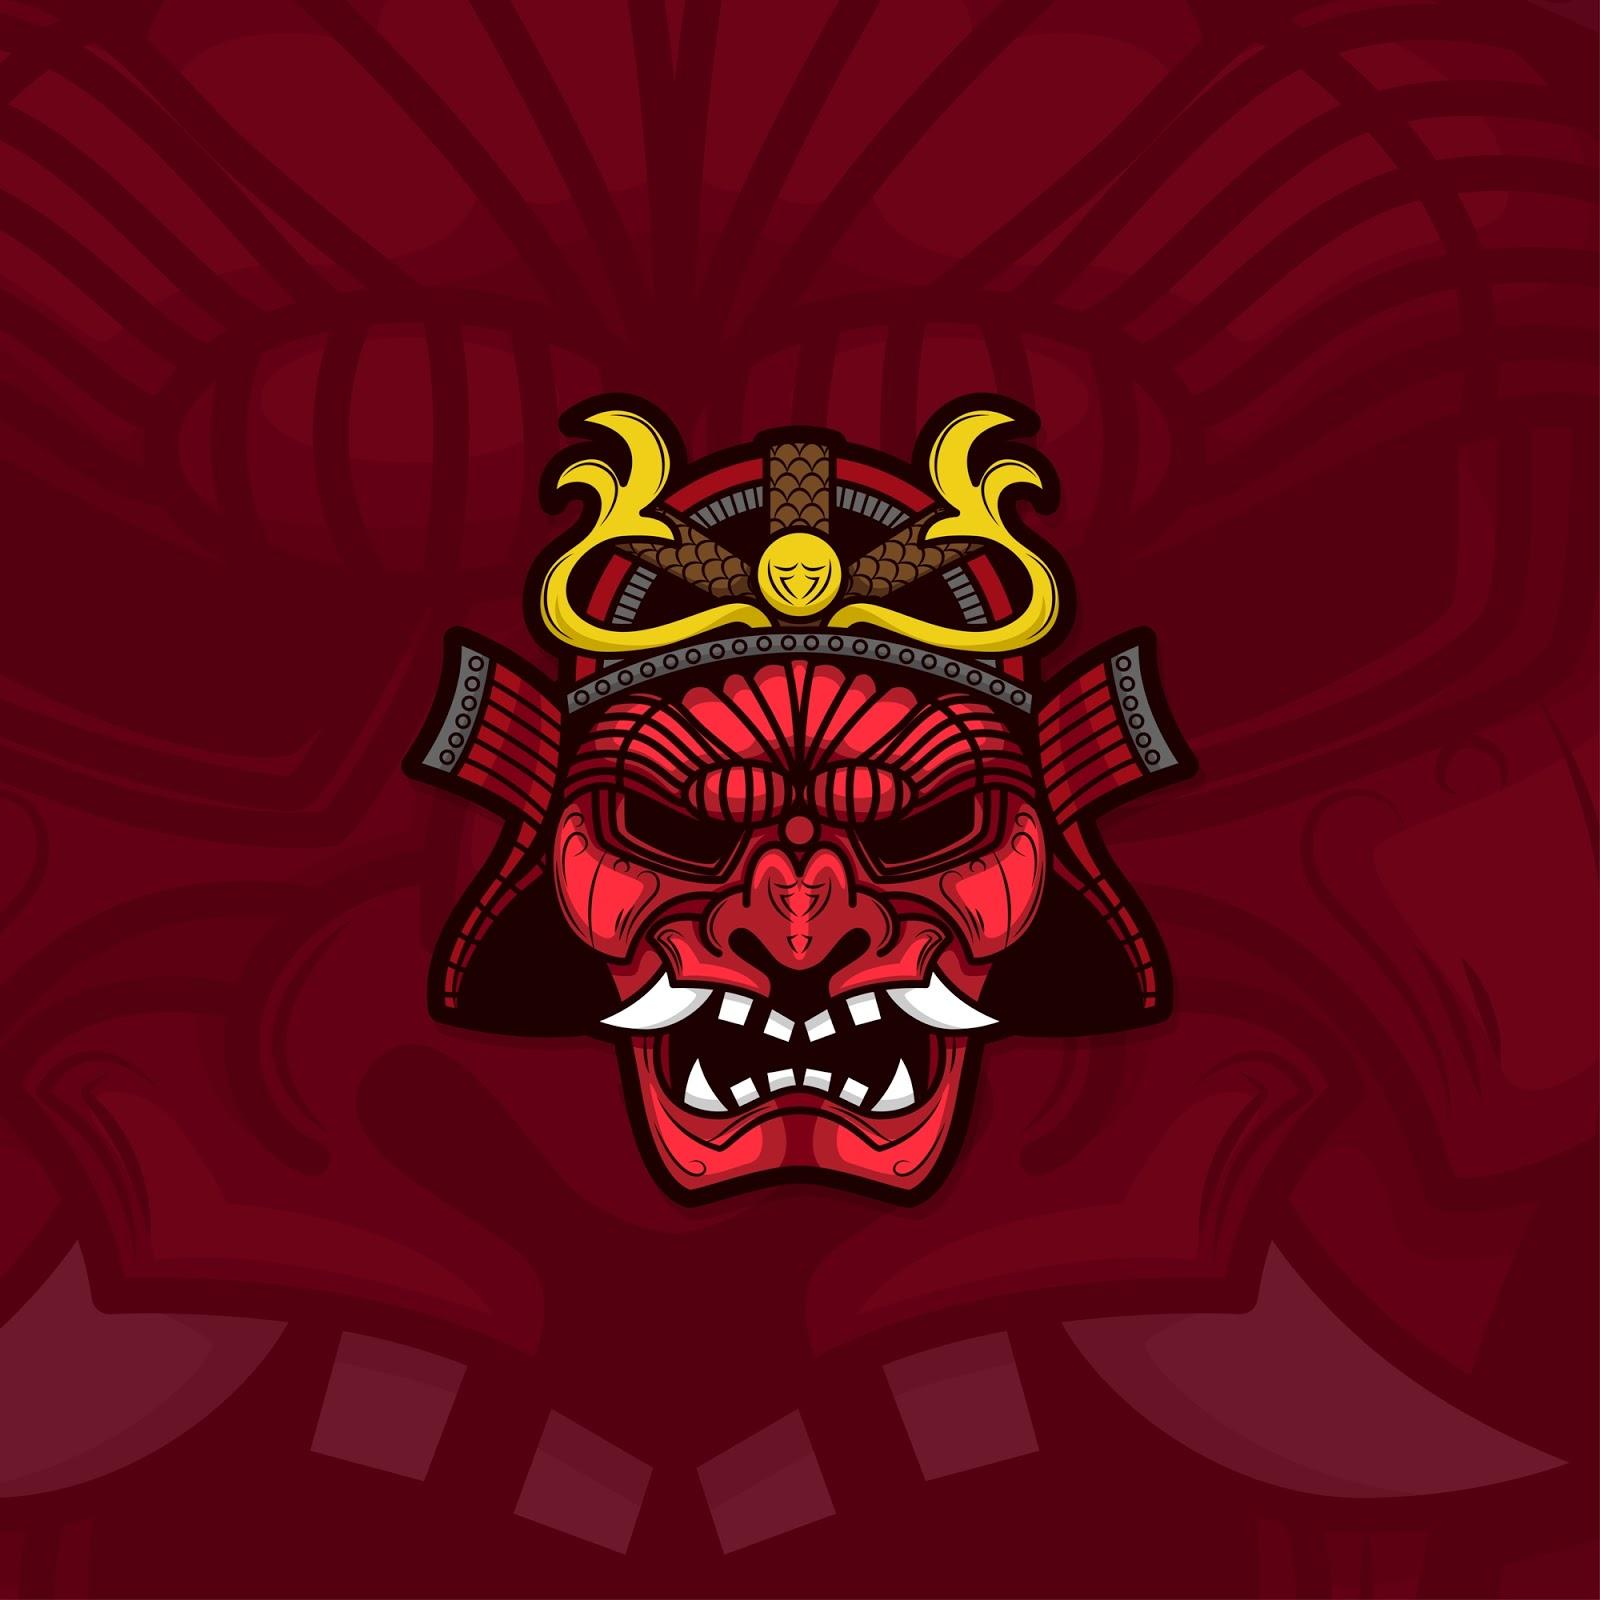 Esport Gamer Logo Samurai Free Download Vector CDR, AI, EPS and PNG Formats